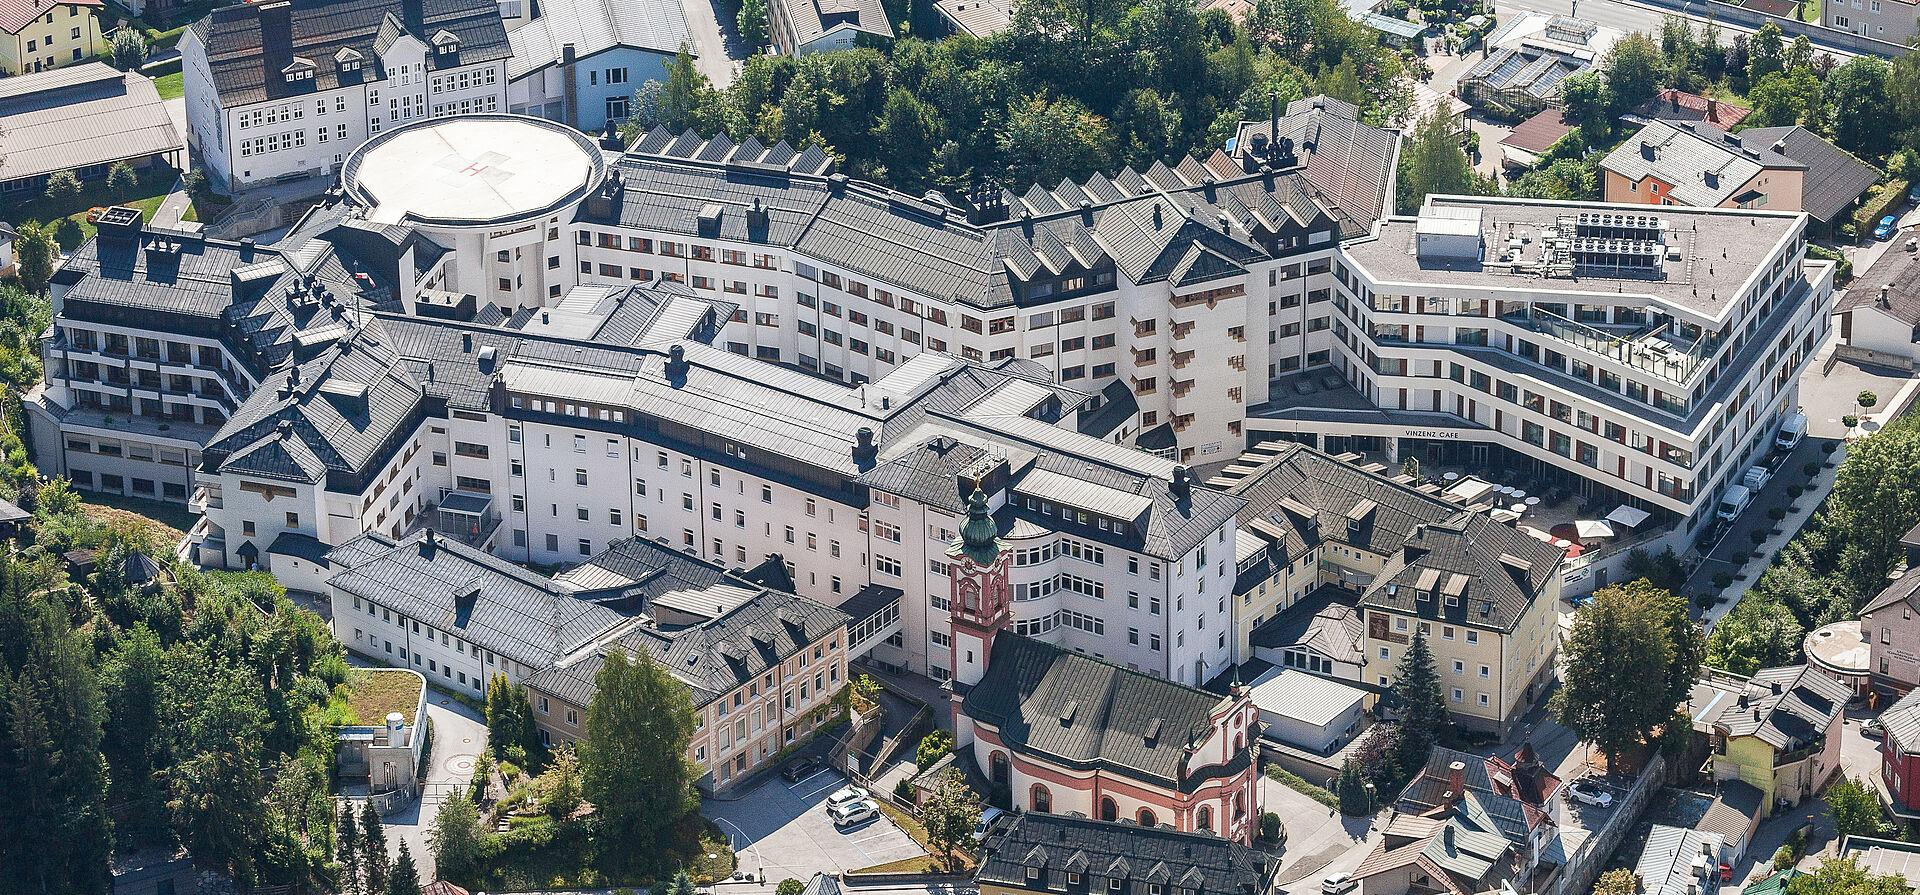 Partnerschaften & Kontakte in Sankt Johann im Pongau